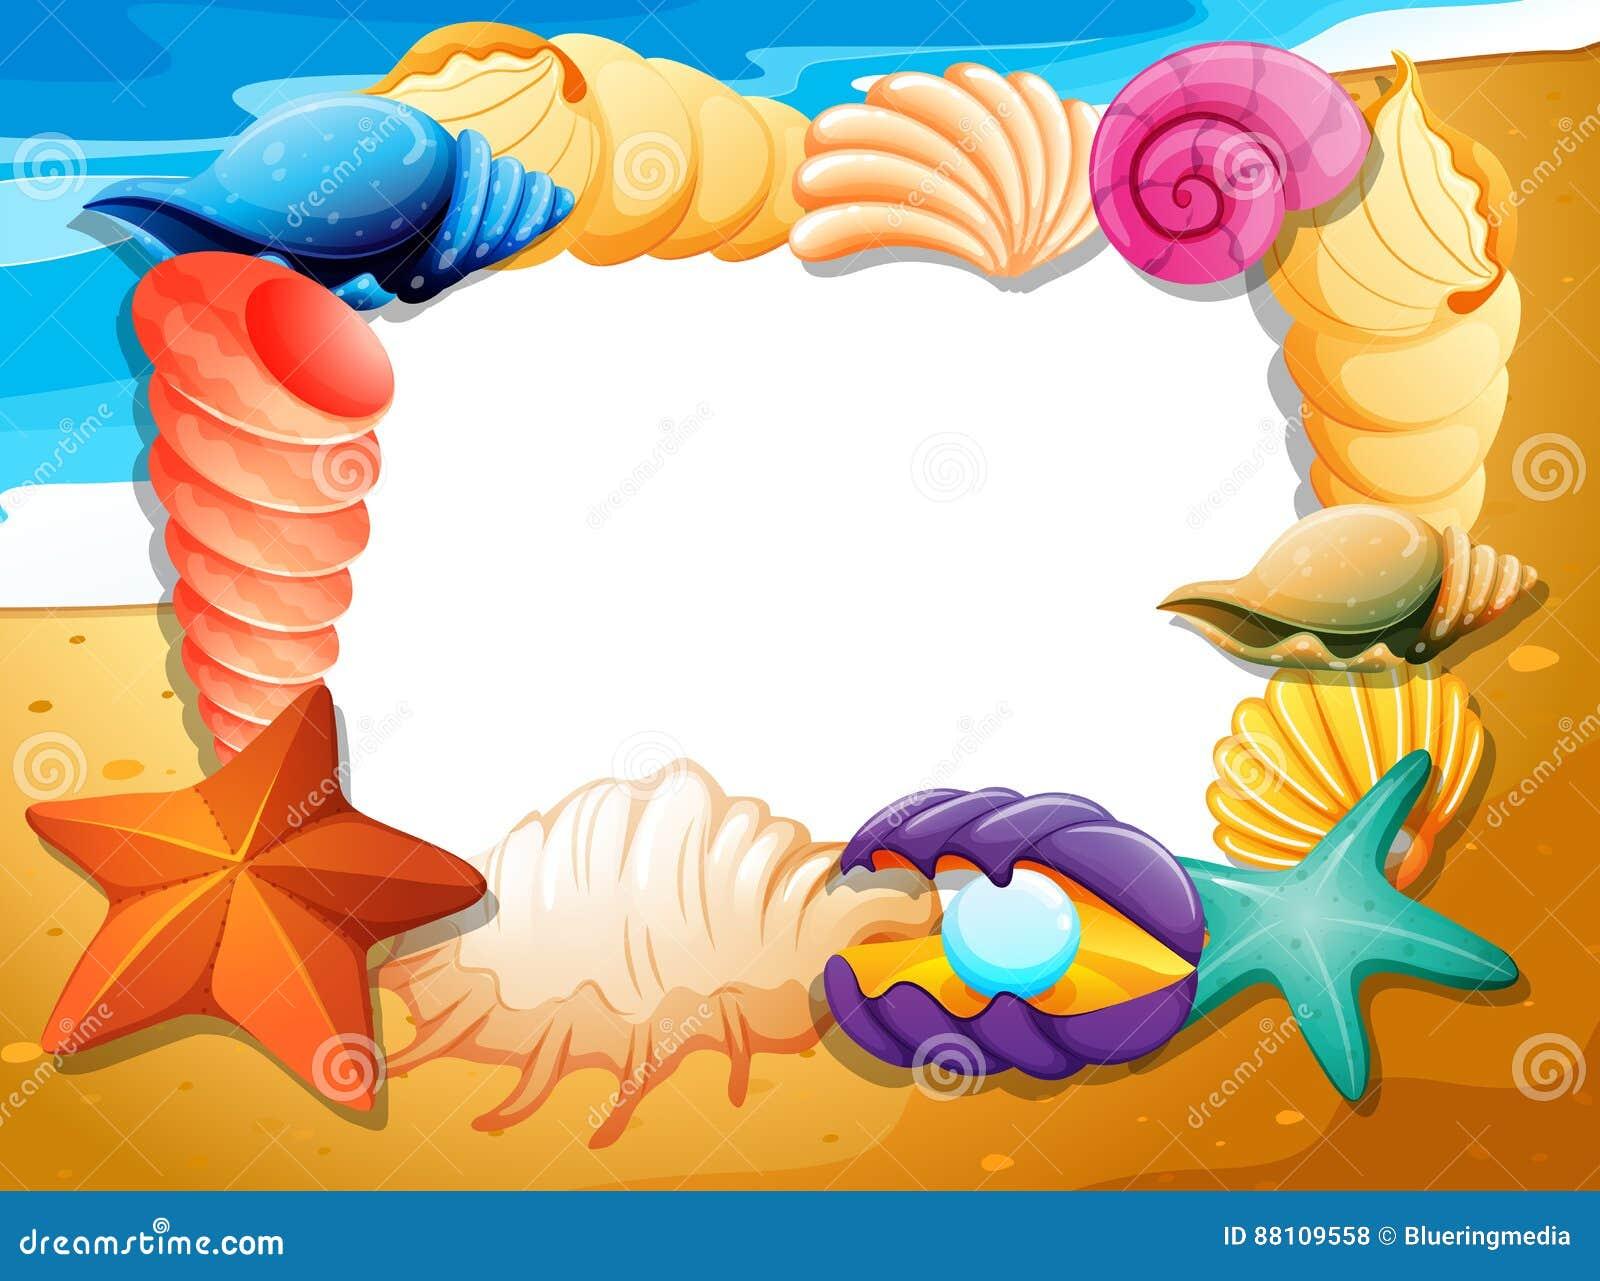 border template with seashells on beach stock vector image 88109558